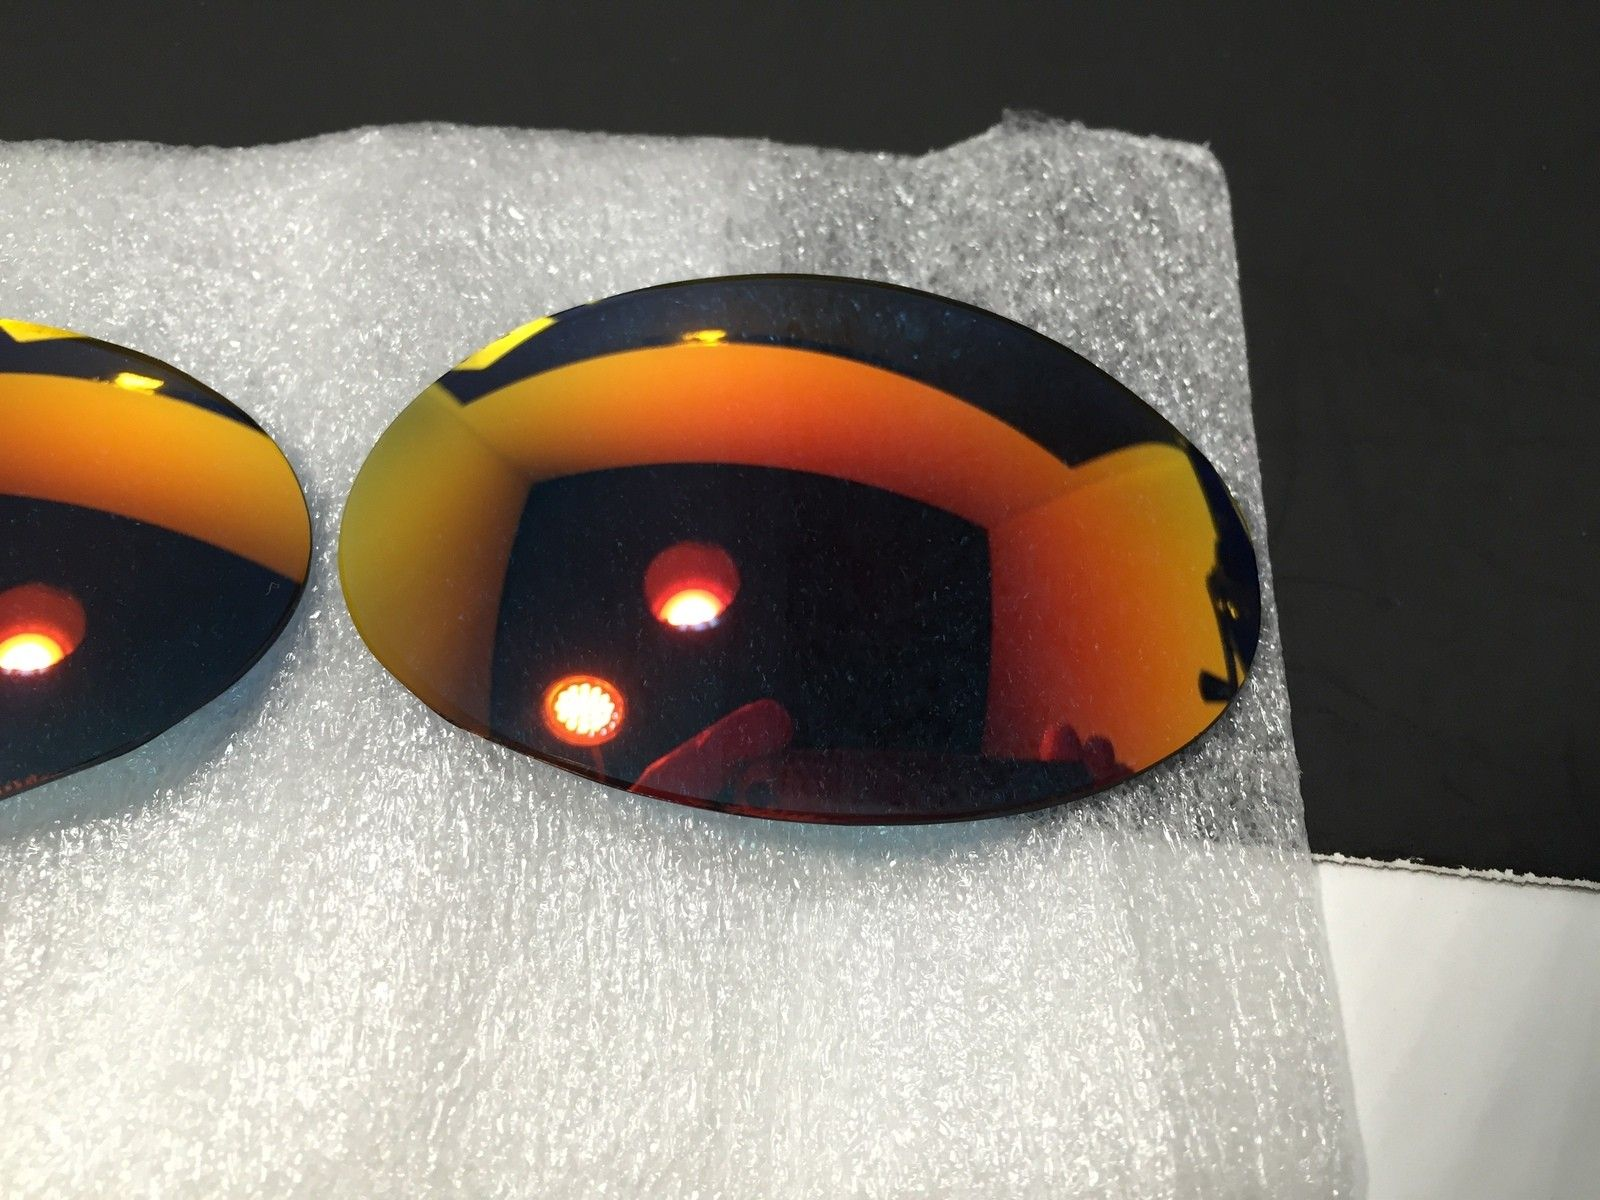 Custom Lenses Romeo 1 Ruby and Juliet Pos Red both New - IMG_1825_2.JPG